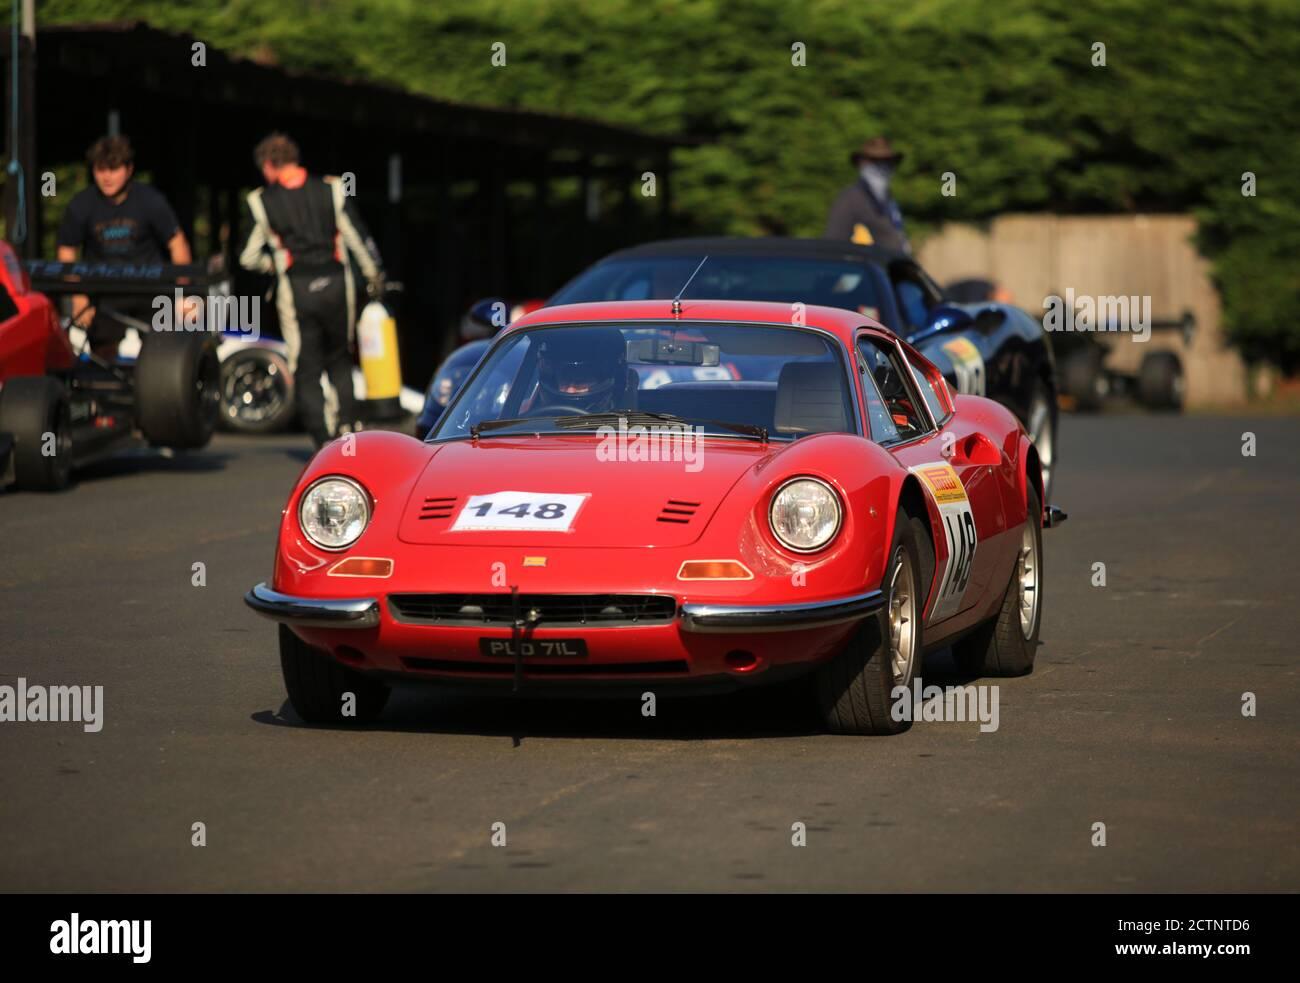 A Red 1973 Ferrari Dino 246 Gt Stock Photo Alamy